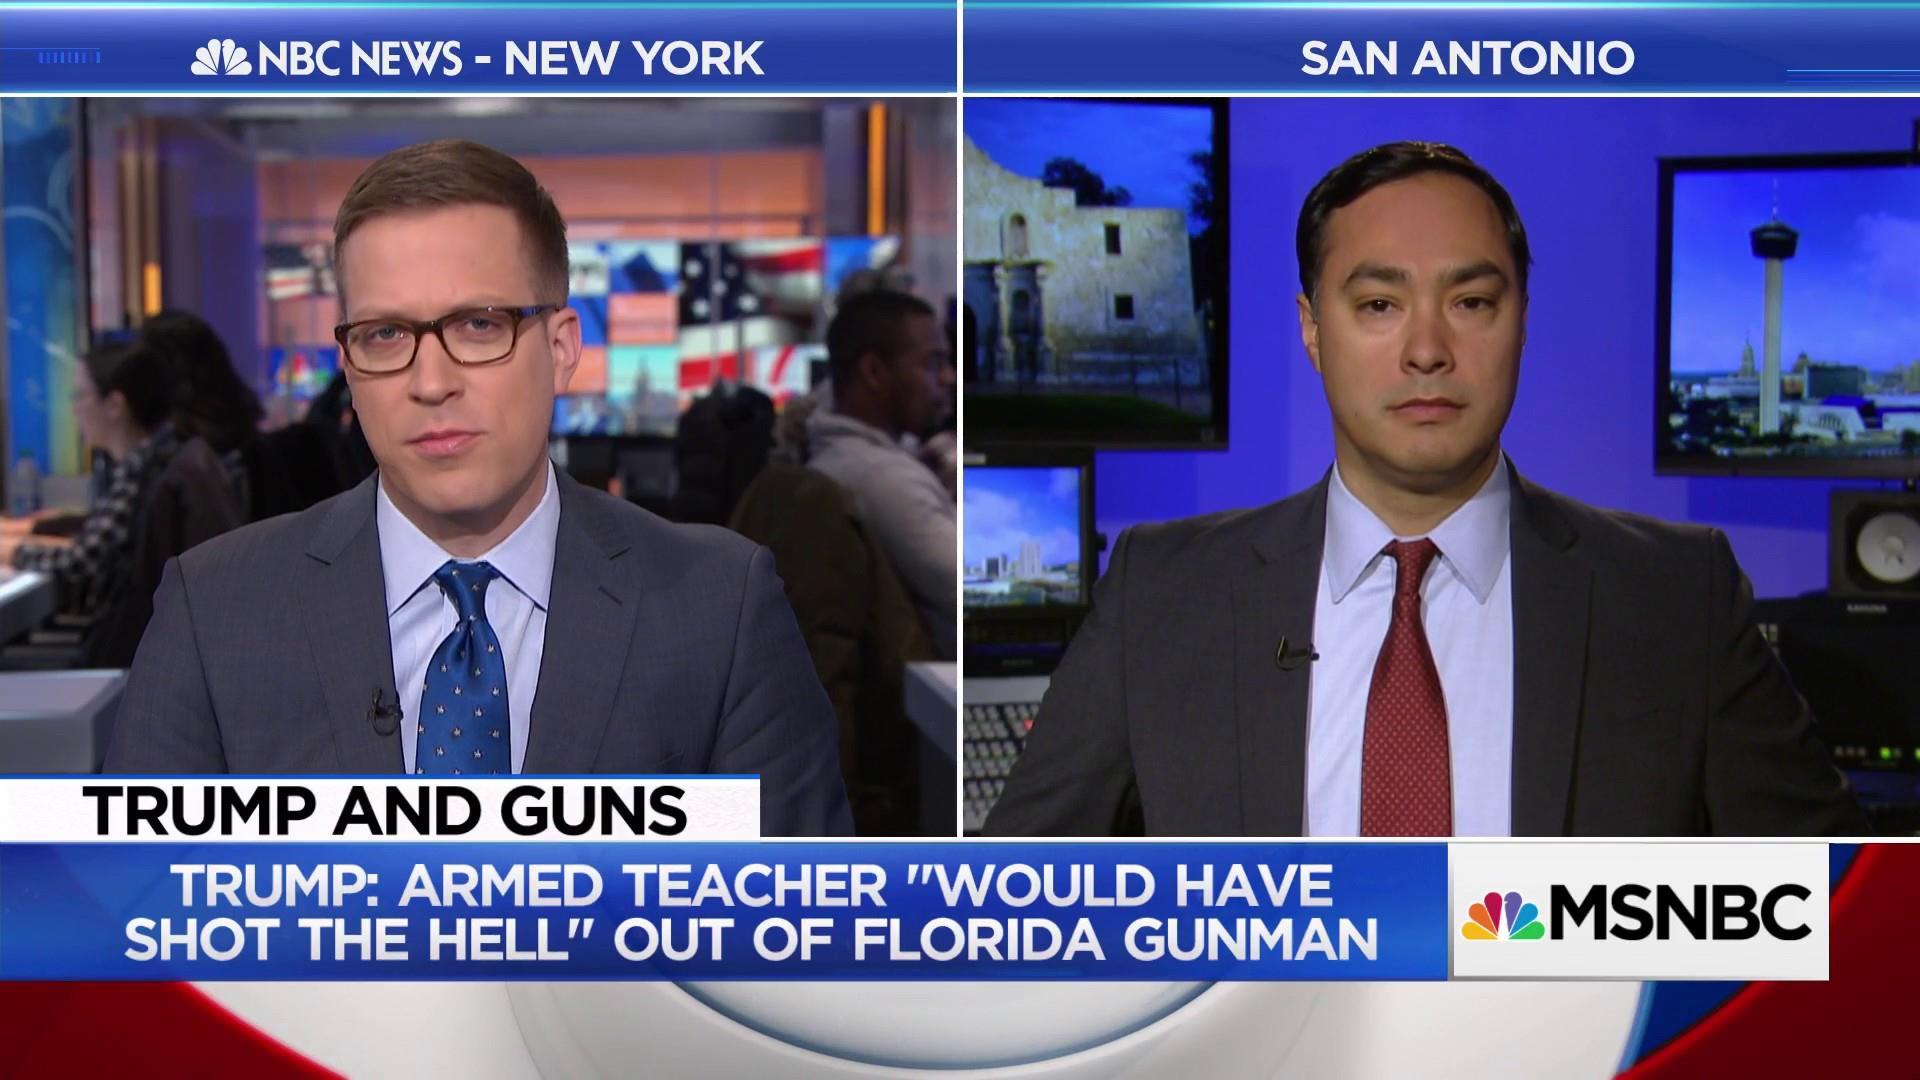 Rep. Joaquin Castro Speaks Out Against Trump's Proposal to Arm Teachers